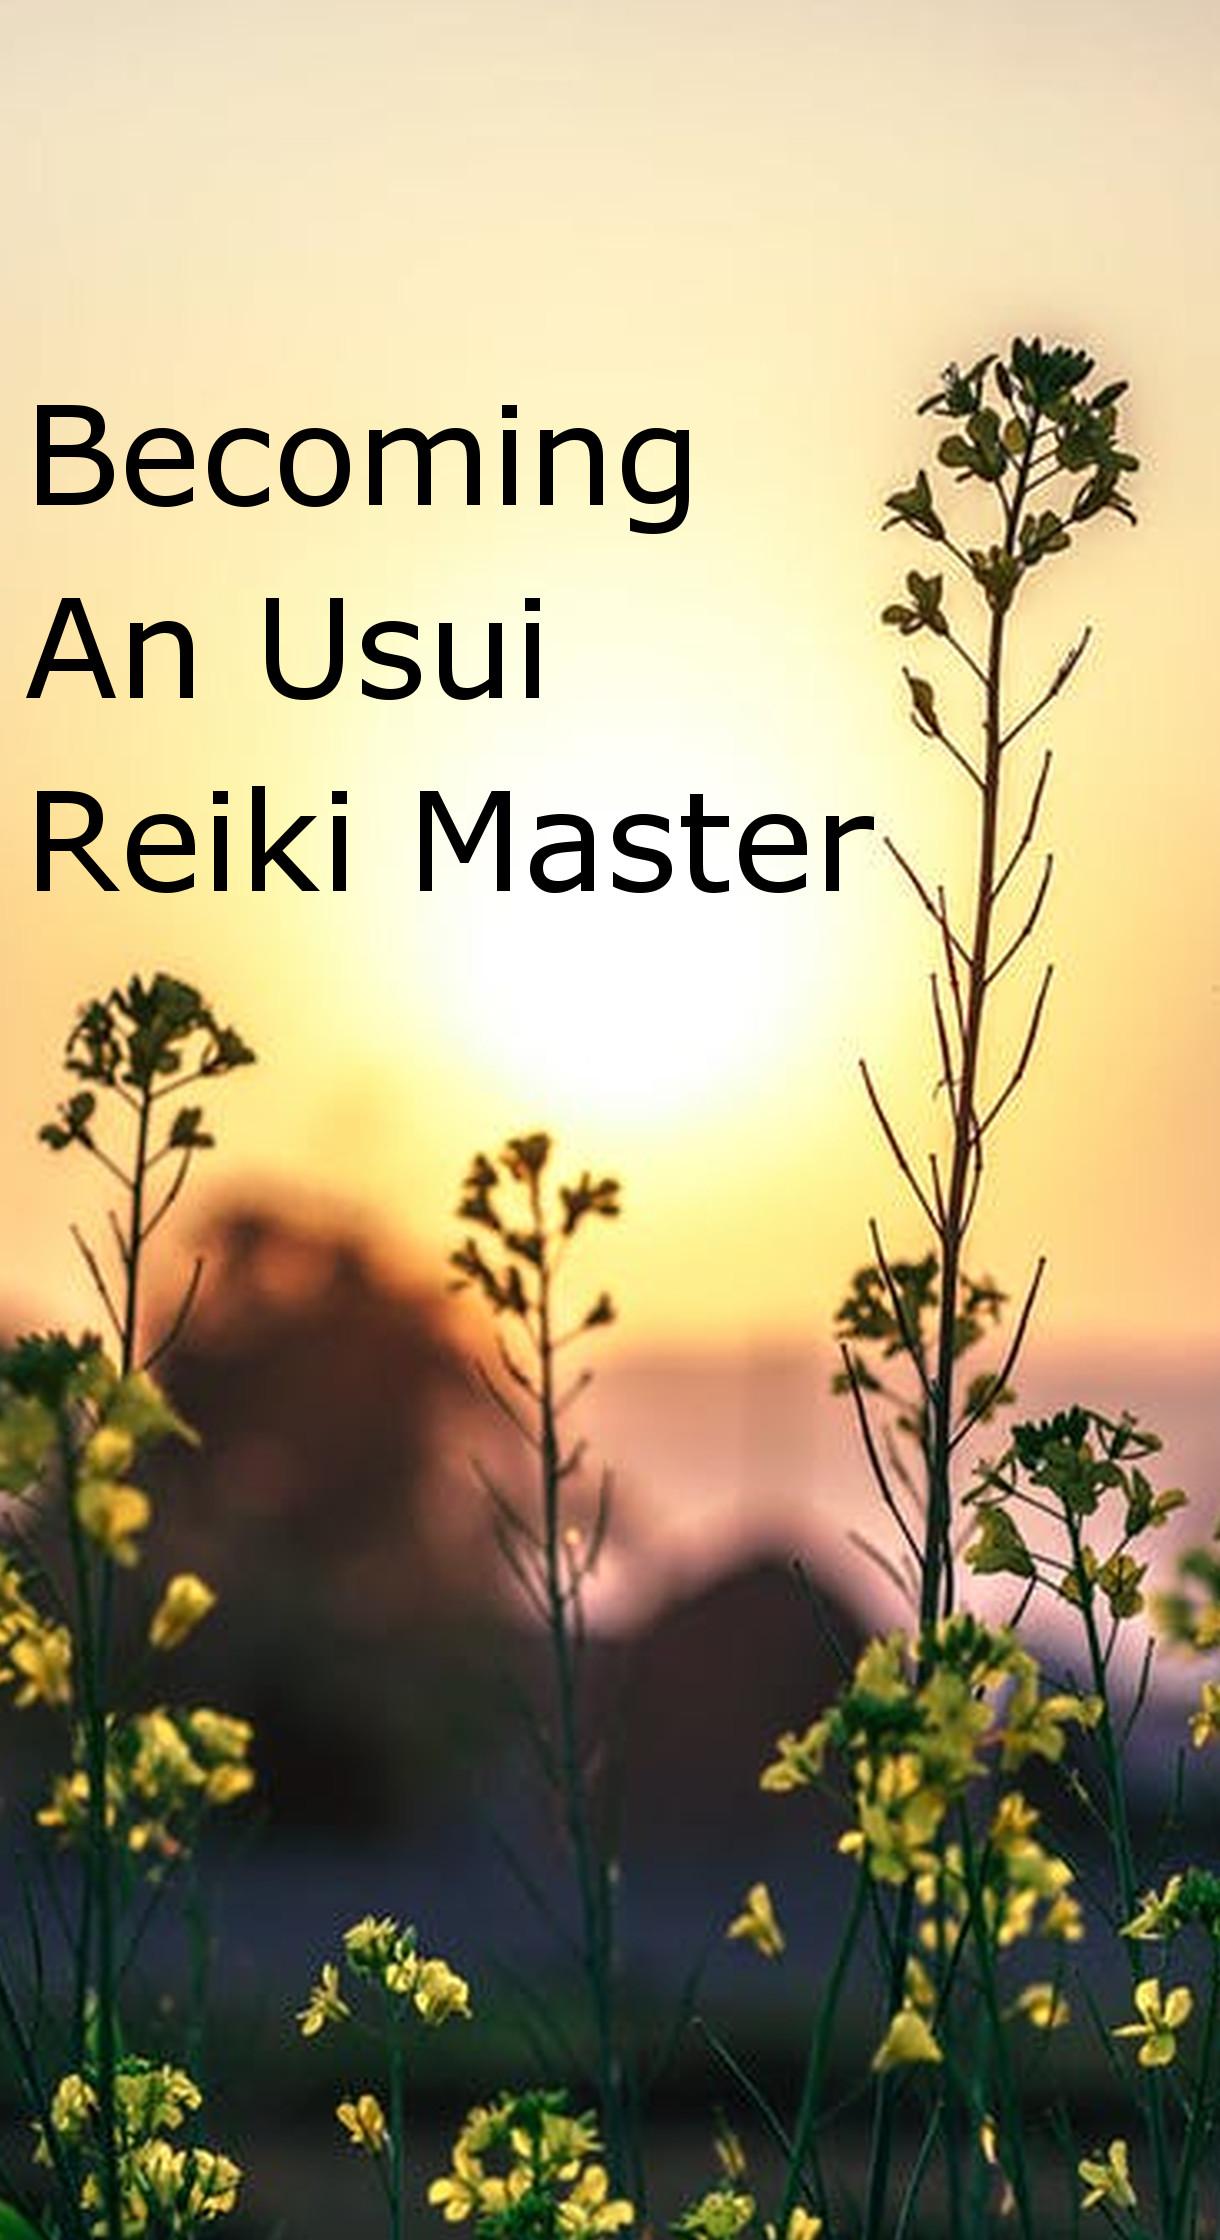 Becoming An Usui Reiki Master